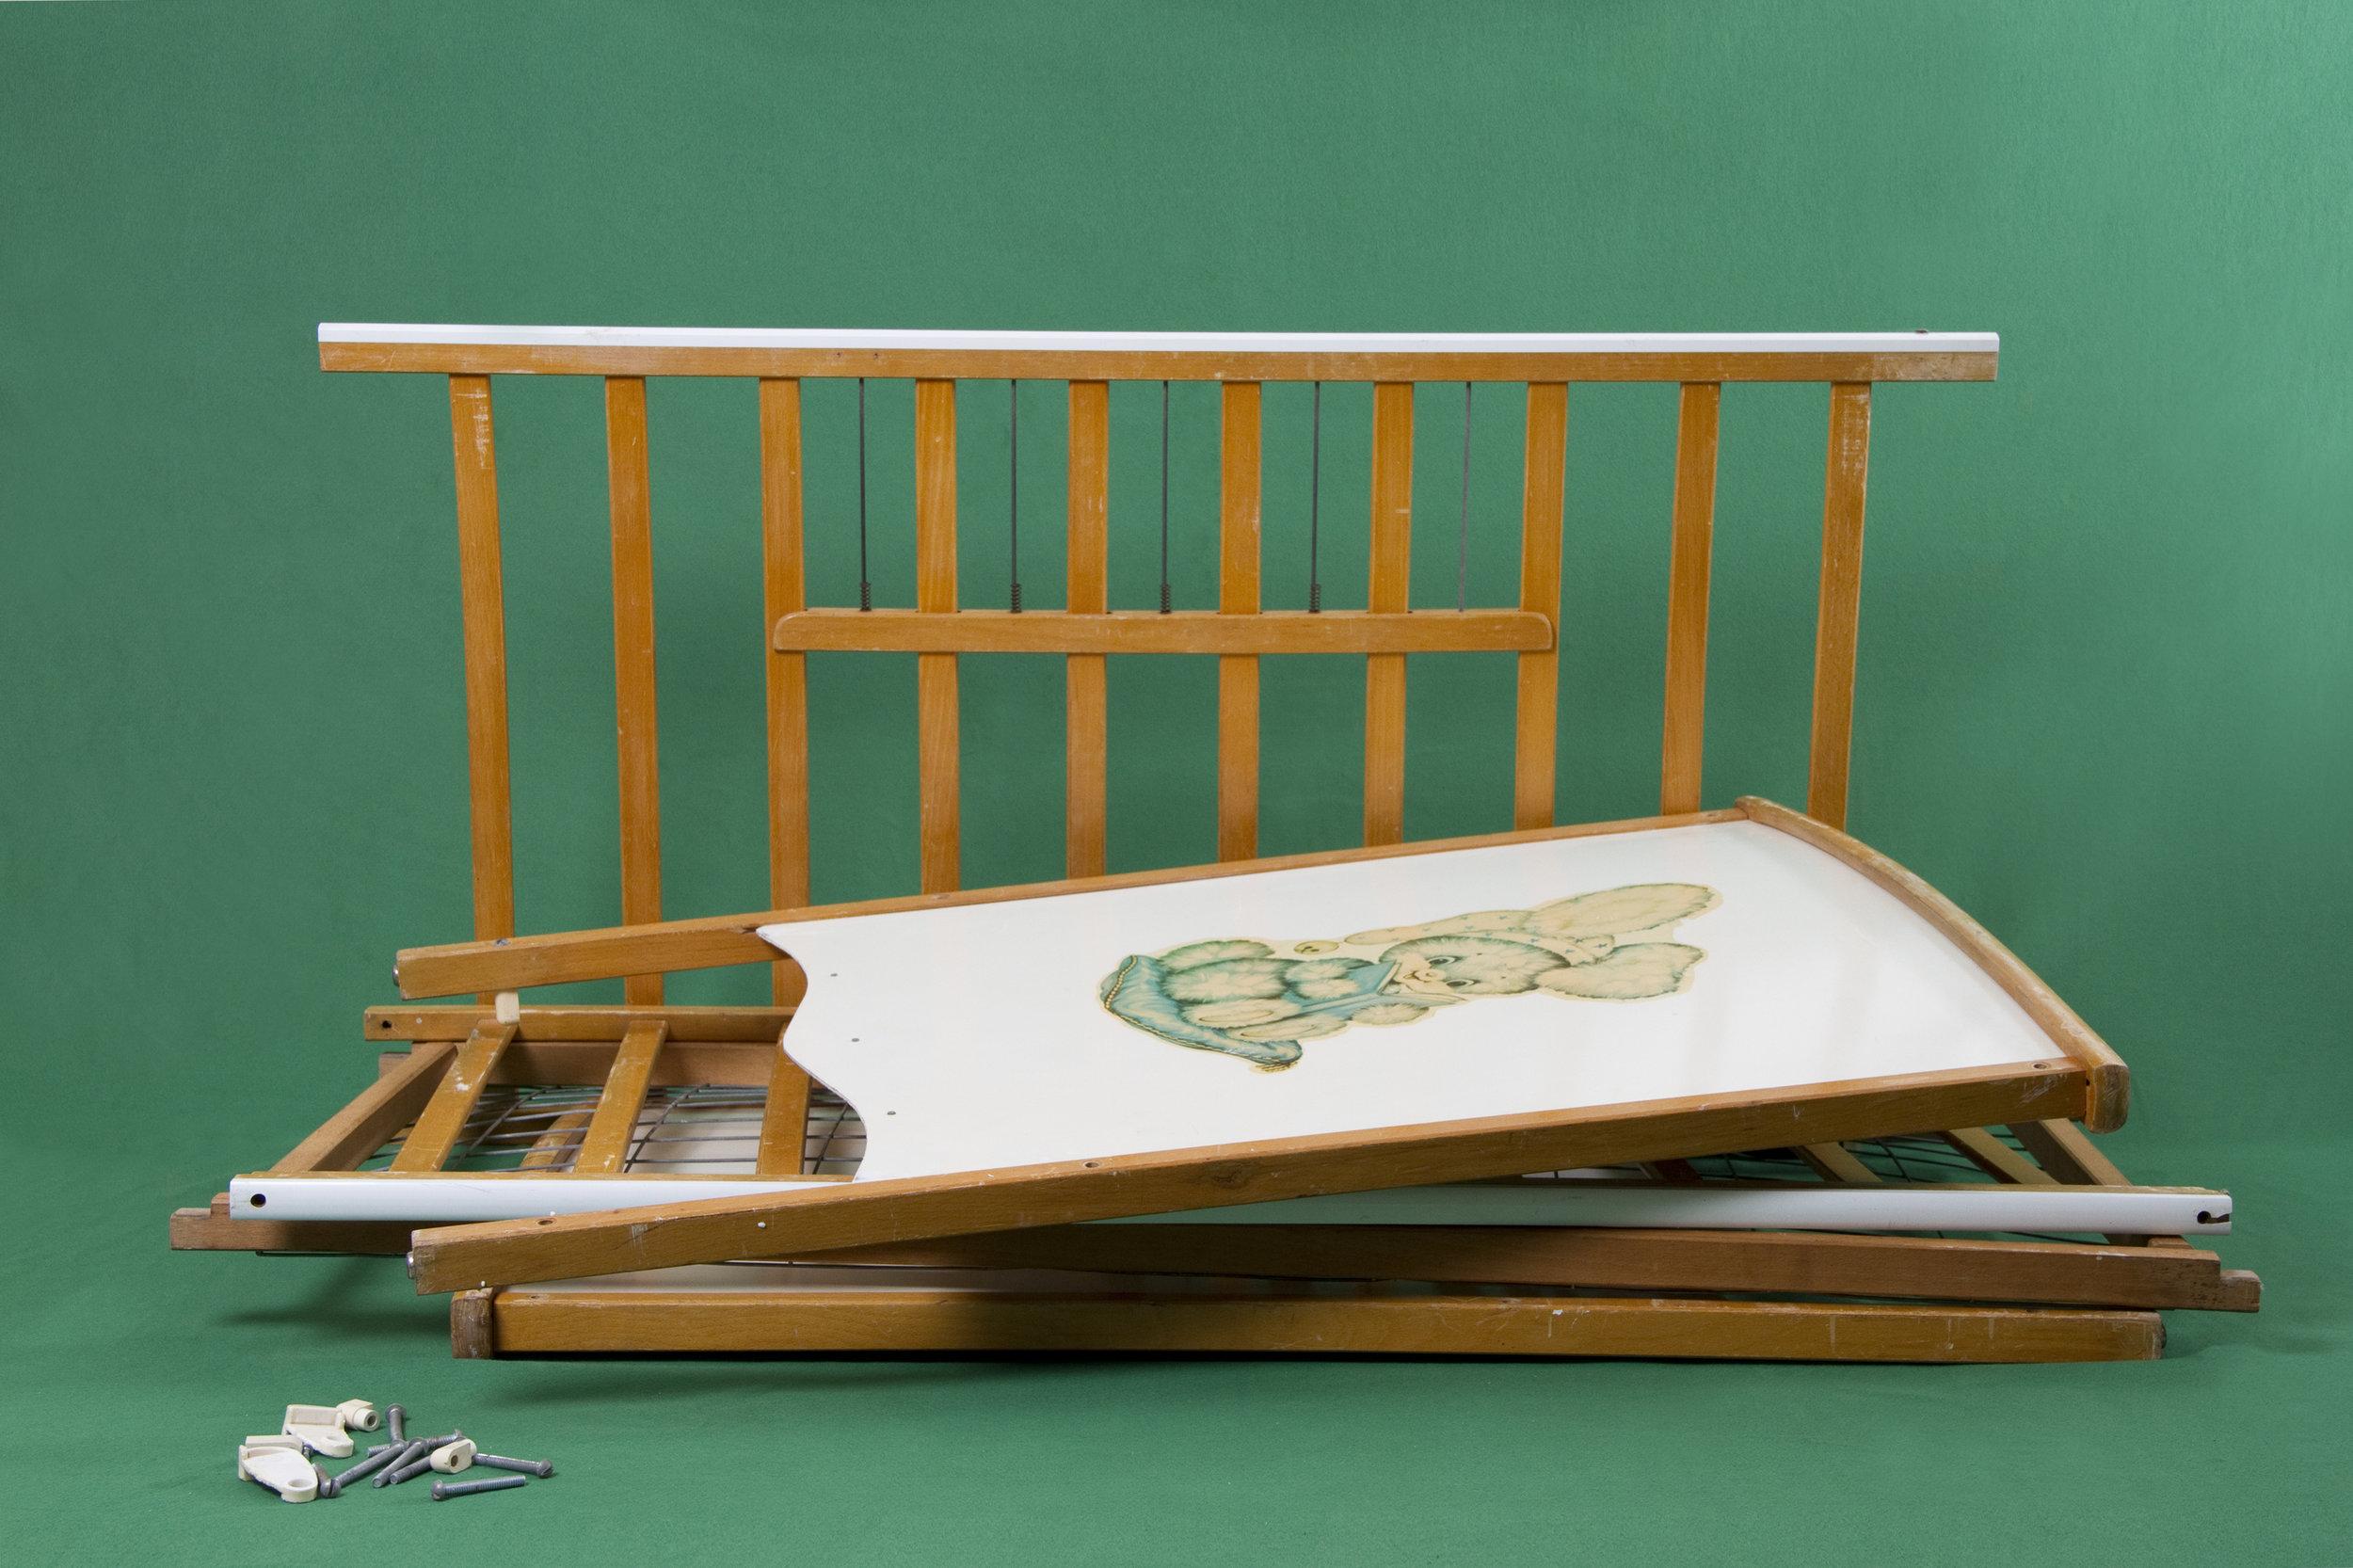 The Deconstructed Crib (1966-JB)